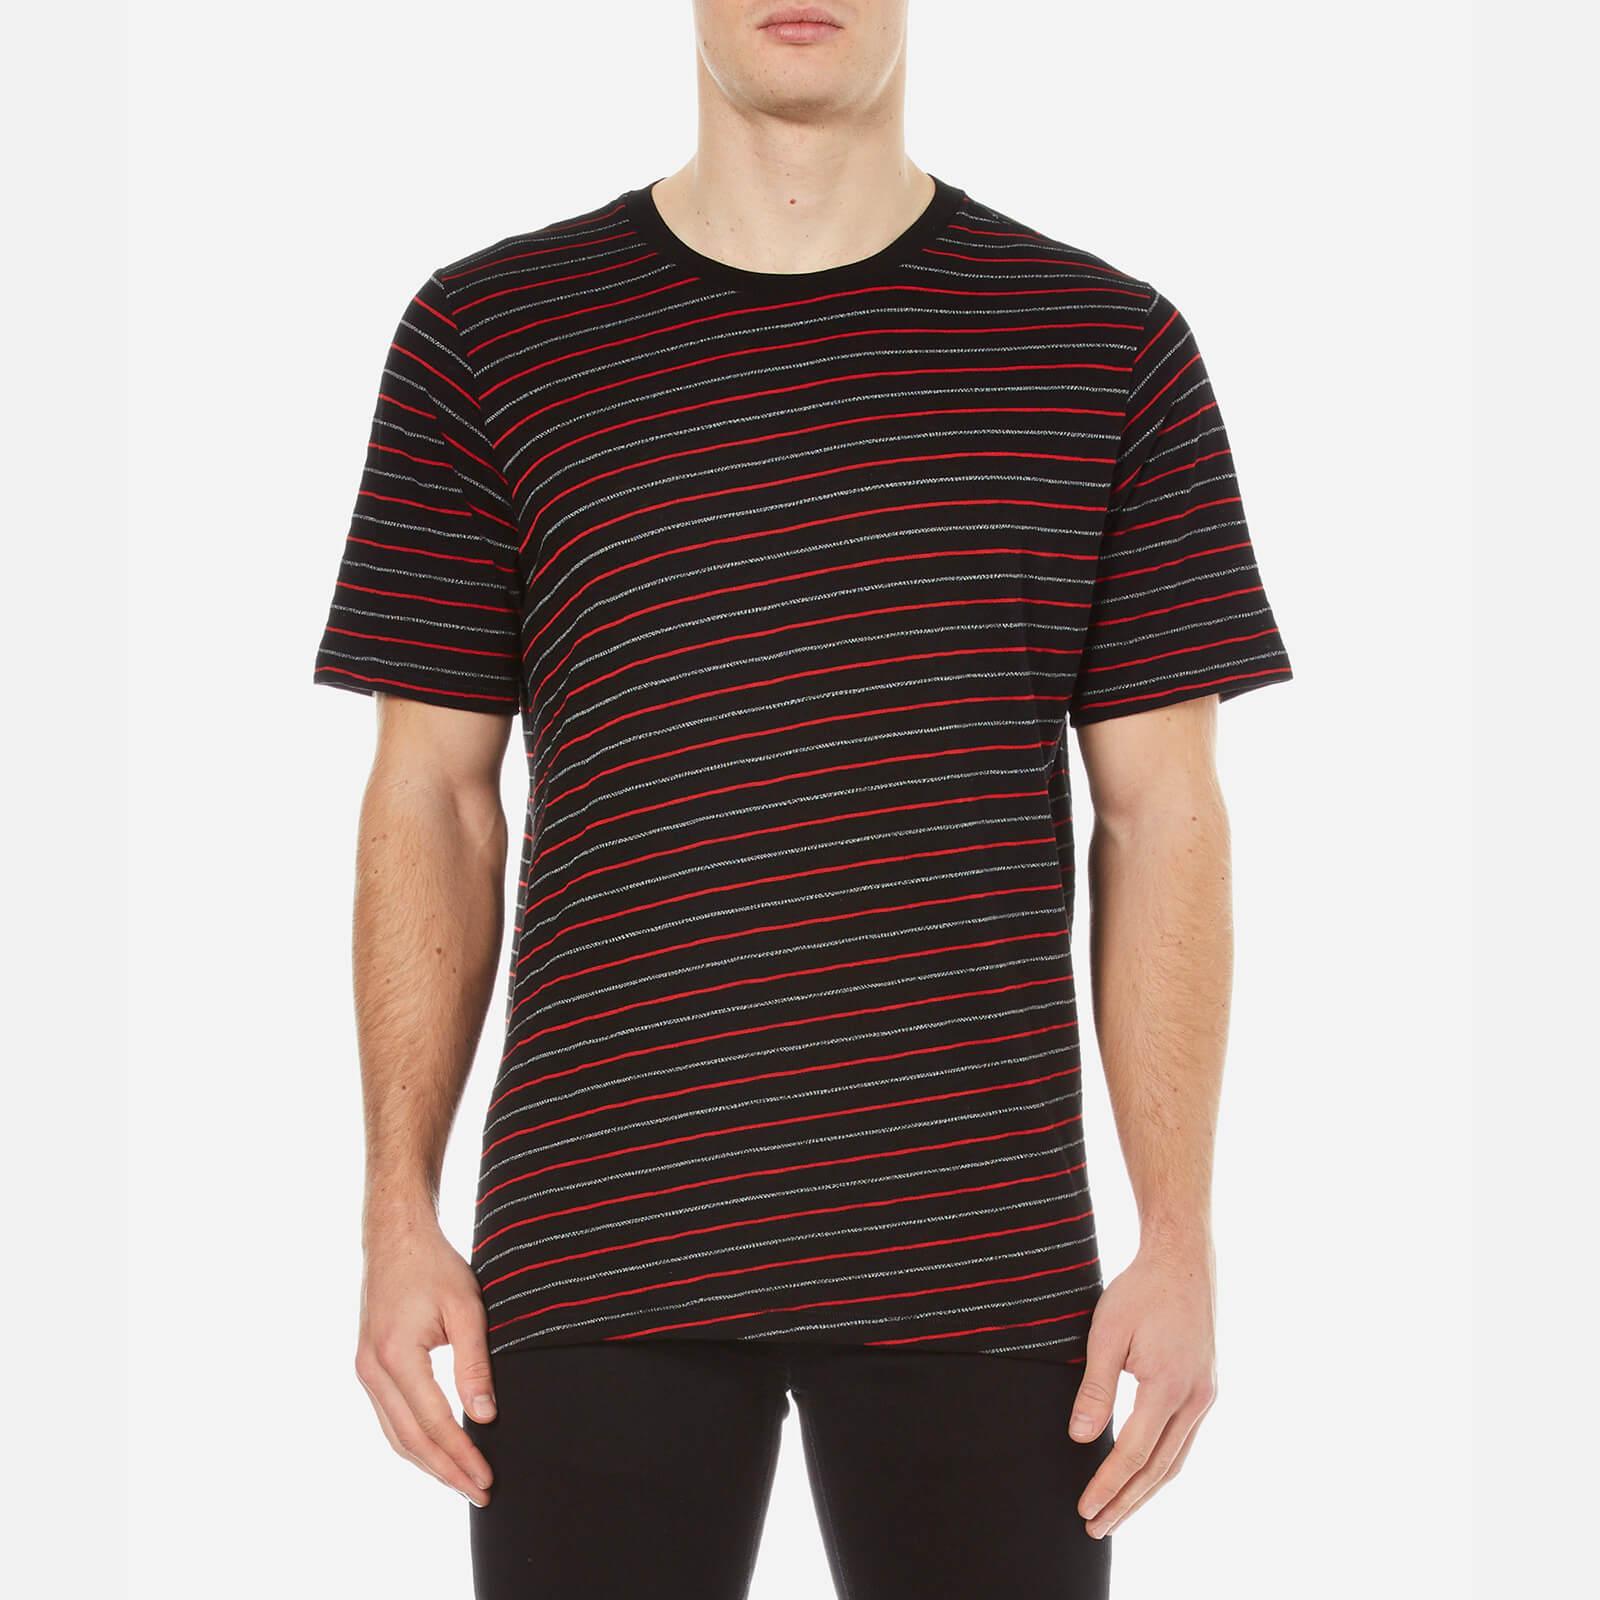 e5eb1696 rag & bone Men's Colin Striped T-Shirt - Black/Red - Free UK Delivery over  £50